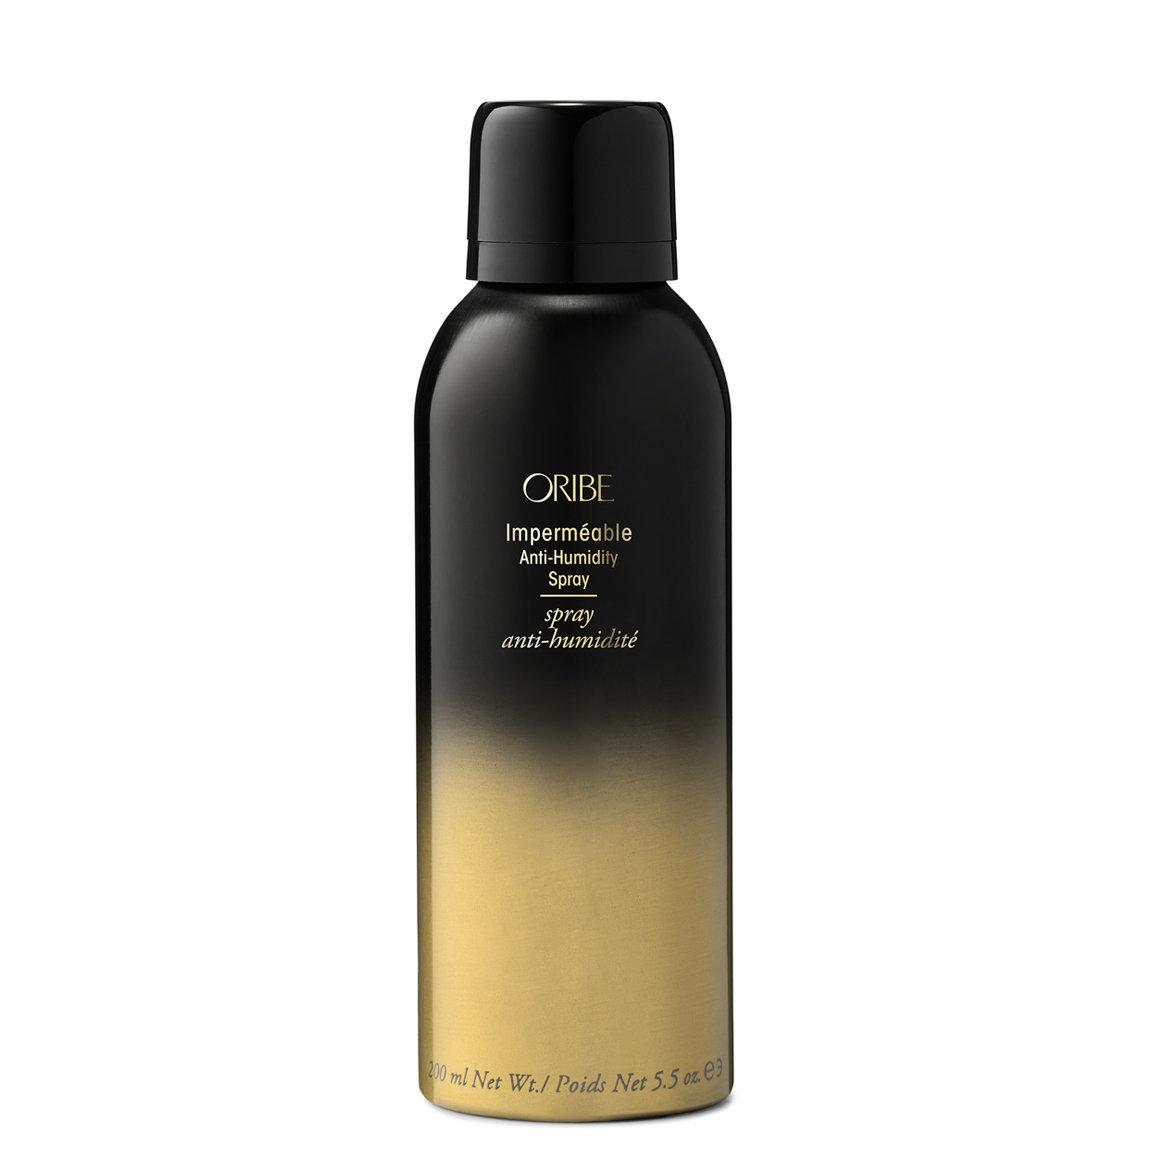 Oribe Imperméable Anti-Humidity Spray 5.5 oz alternative view 1 - product swatch.